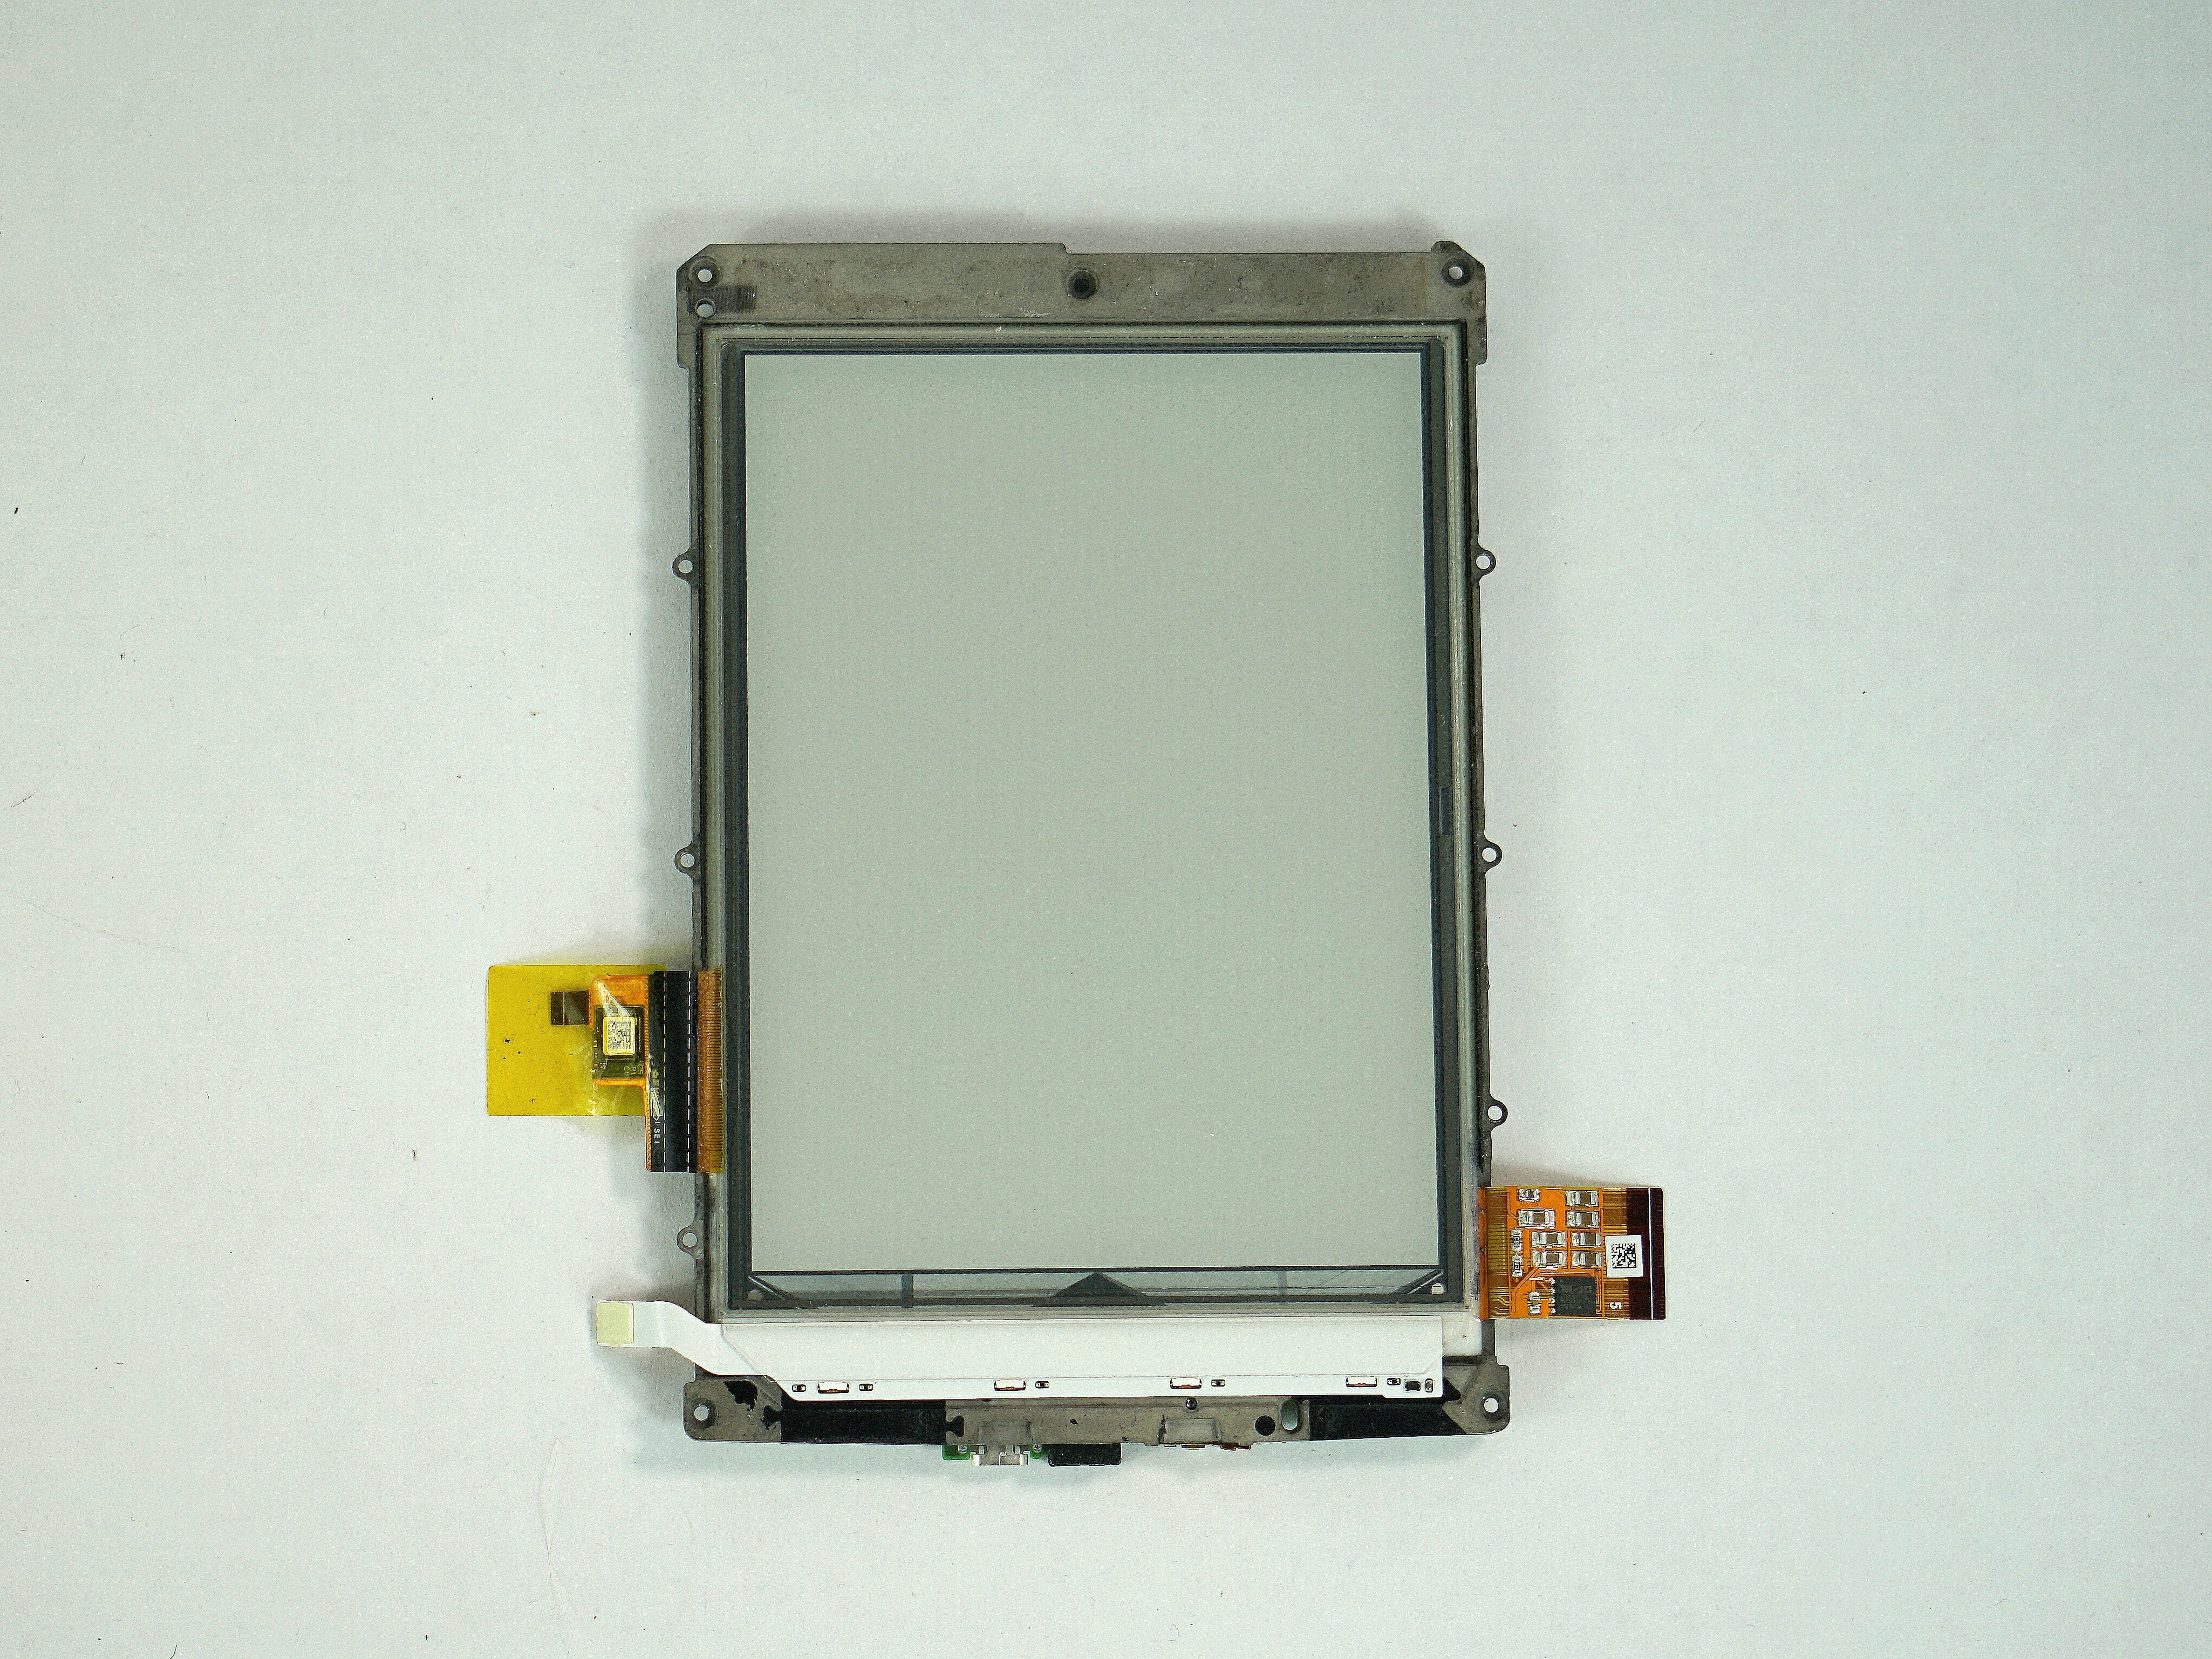 Kindle Paperwhite 7th Generation Repair - iFixit